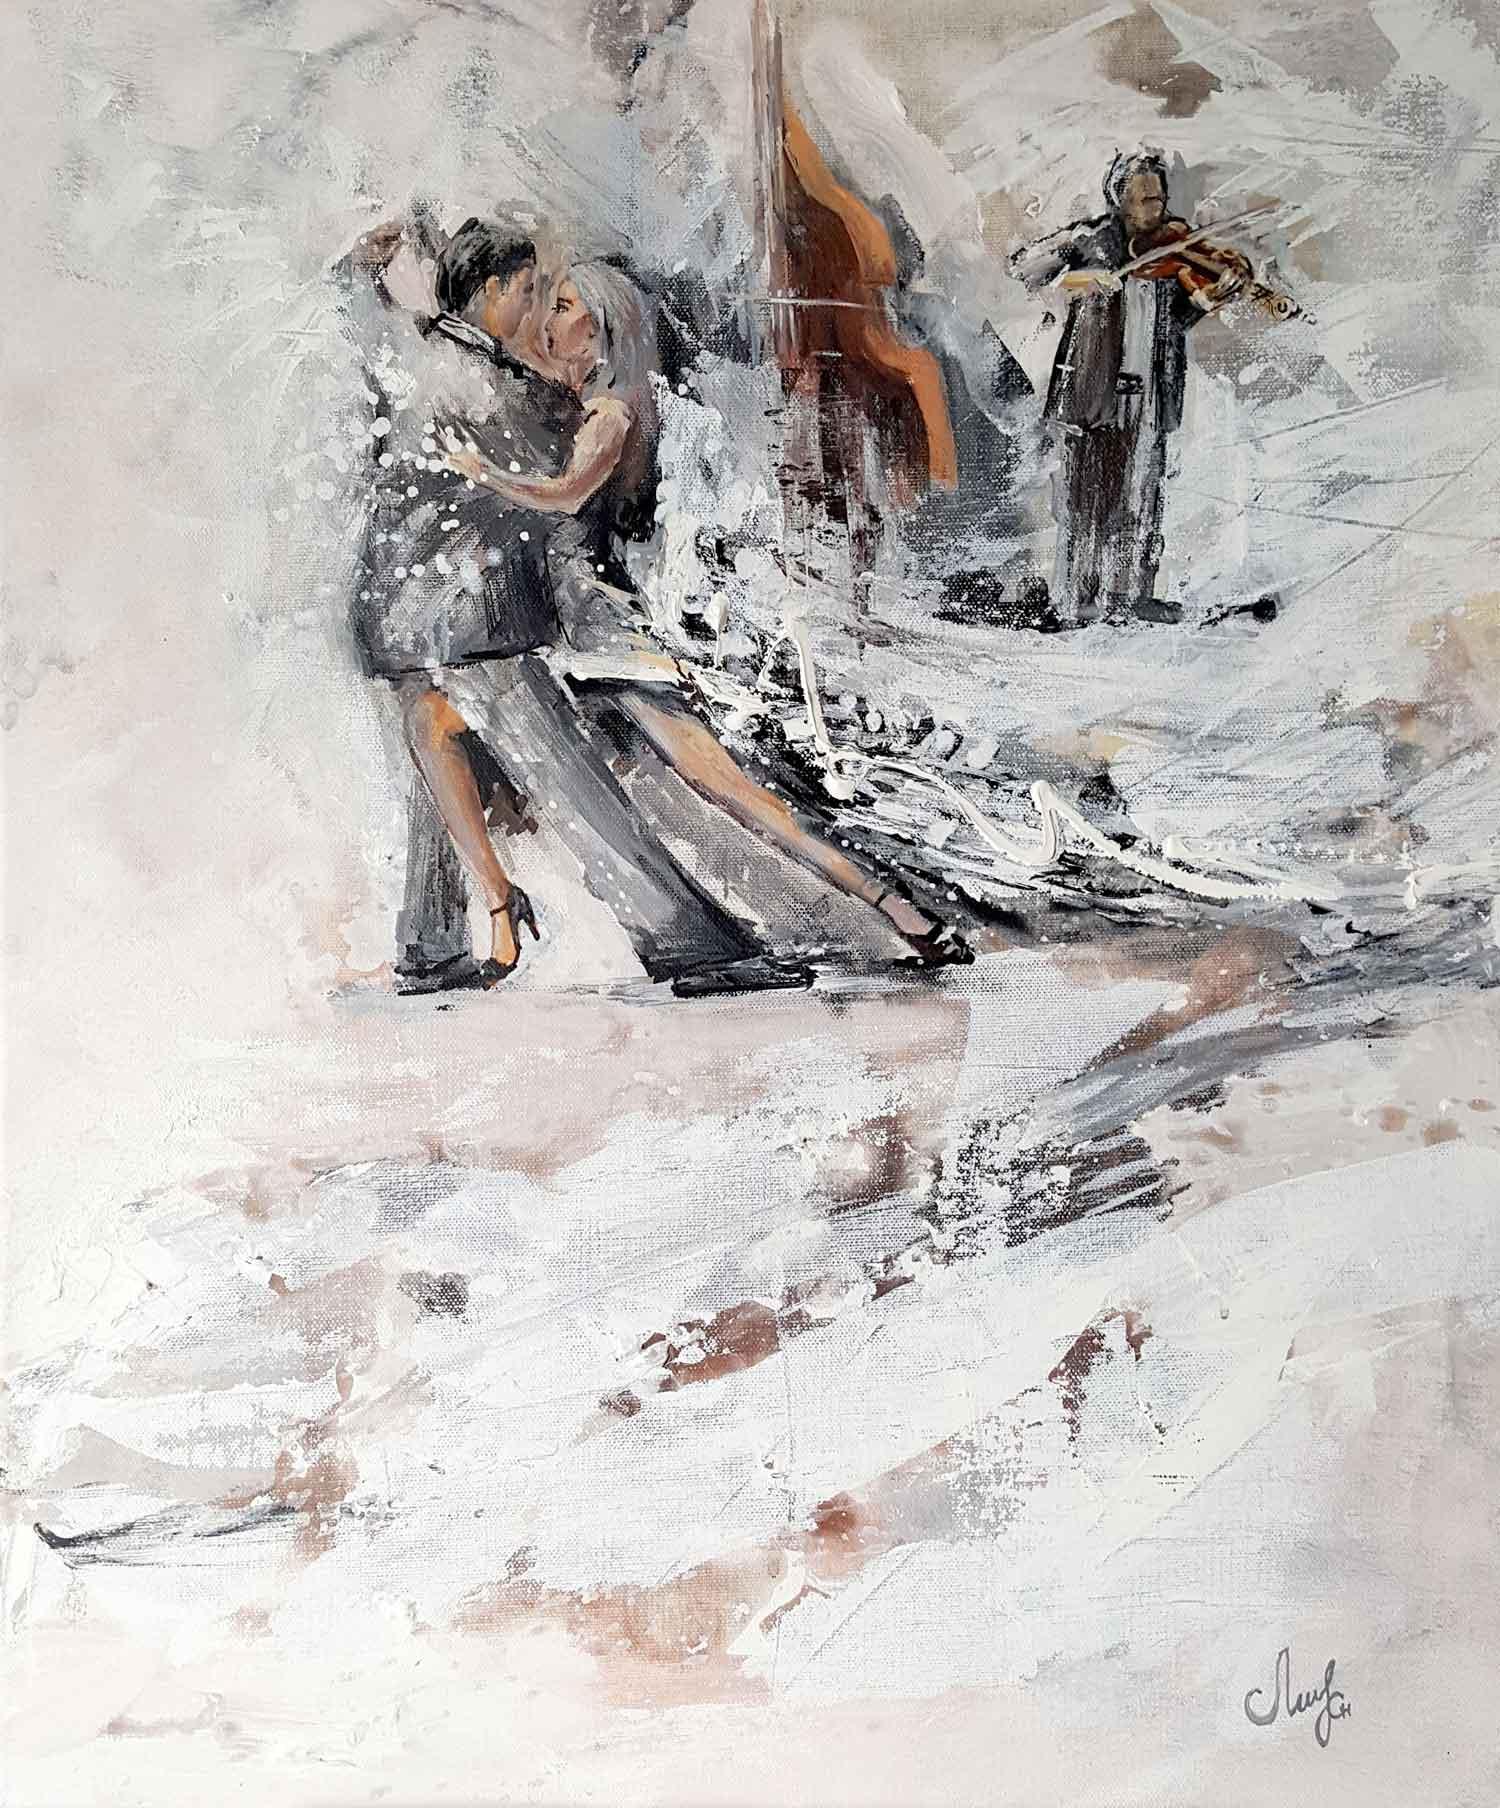 Dance-Impulse-acrylic-painting-by-Lana-Leuchuk